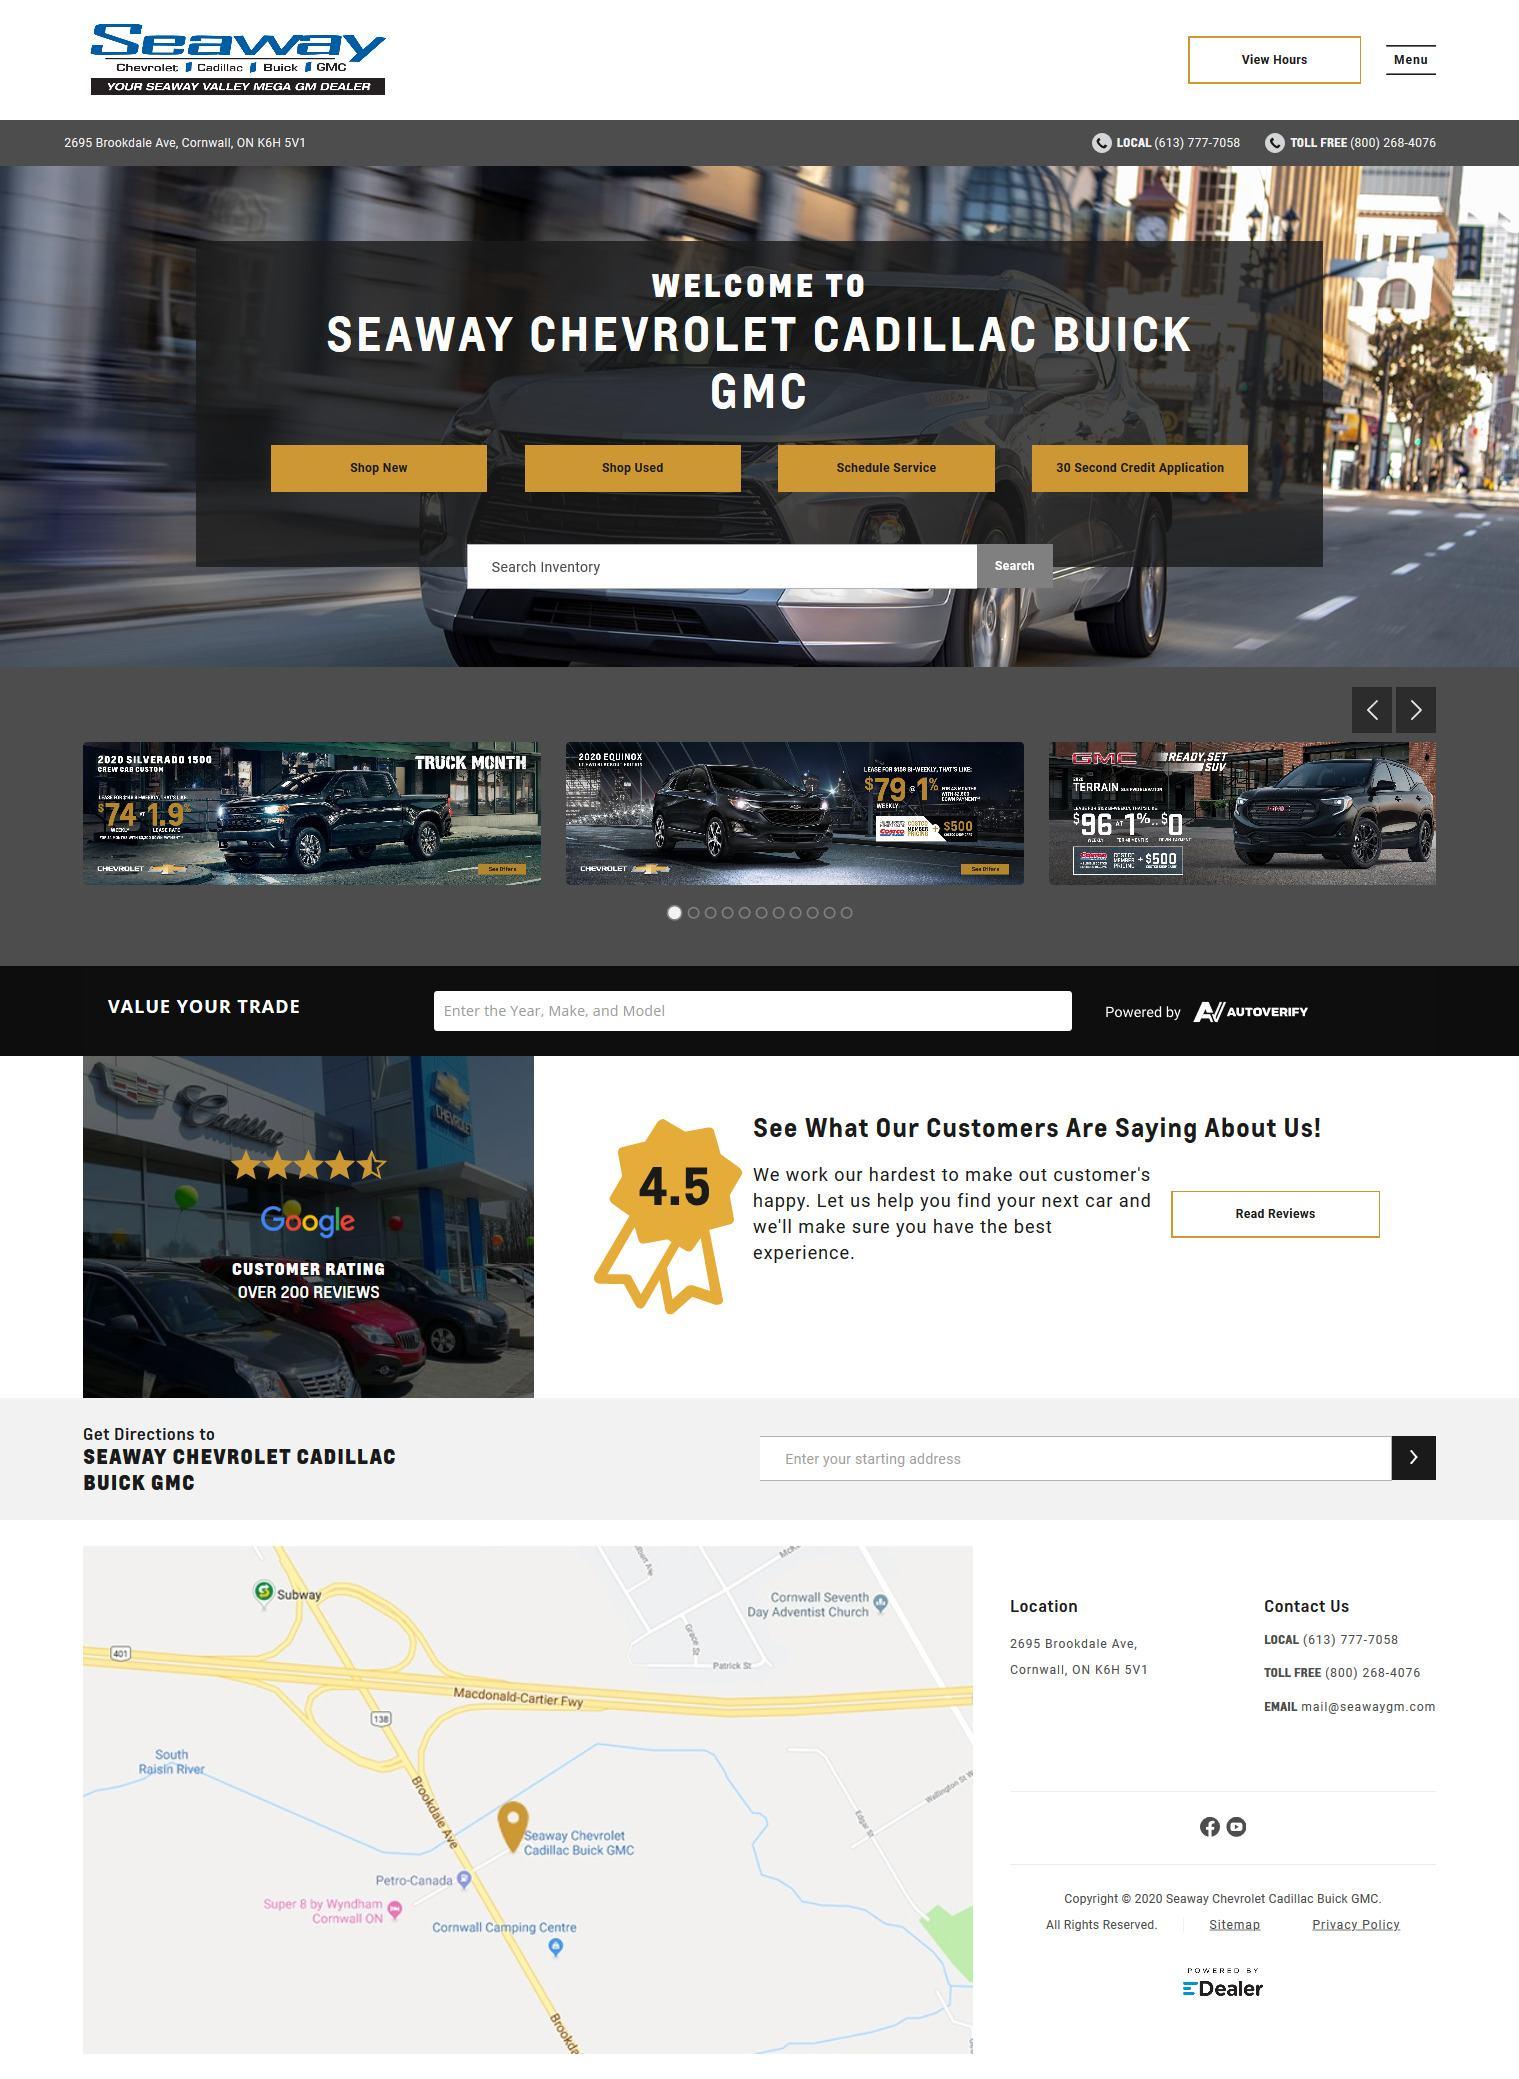 Seaway Chevrolet Cadillac Buick GMC Ltd